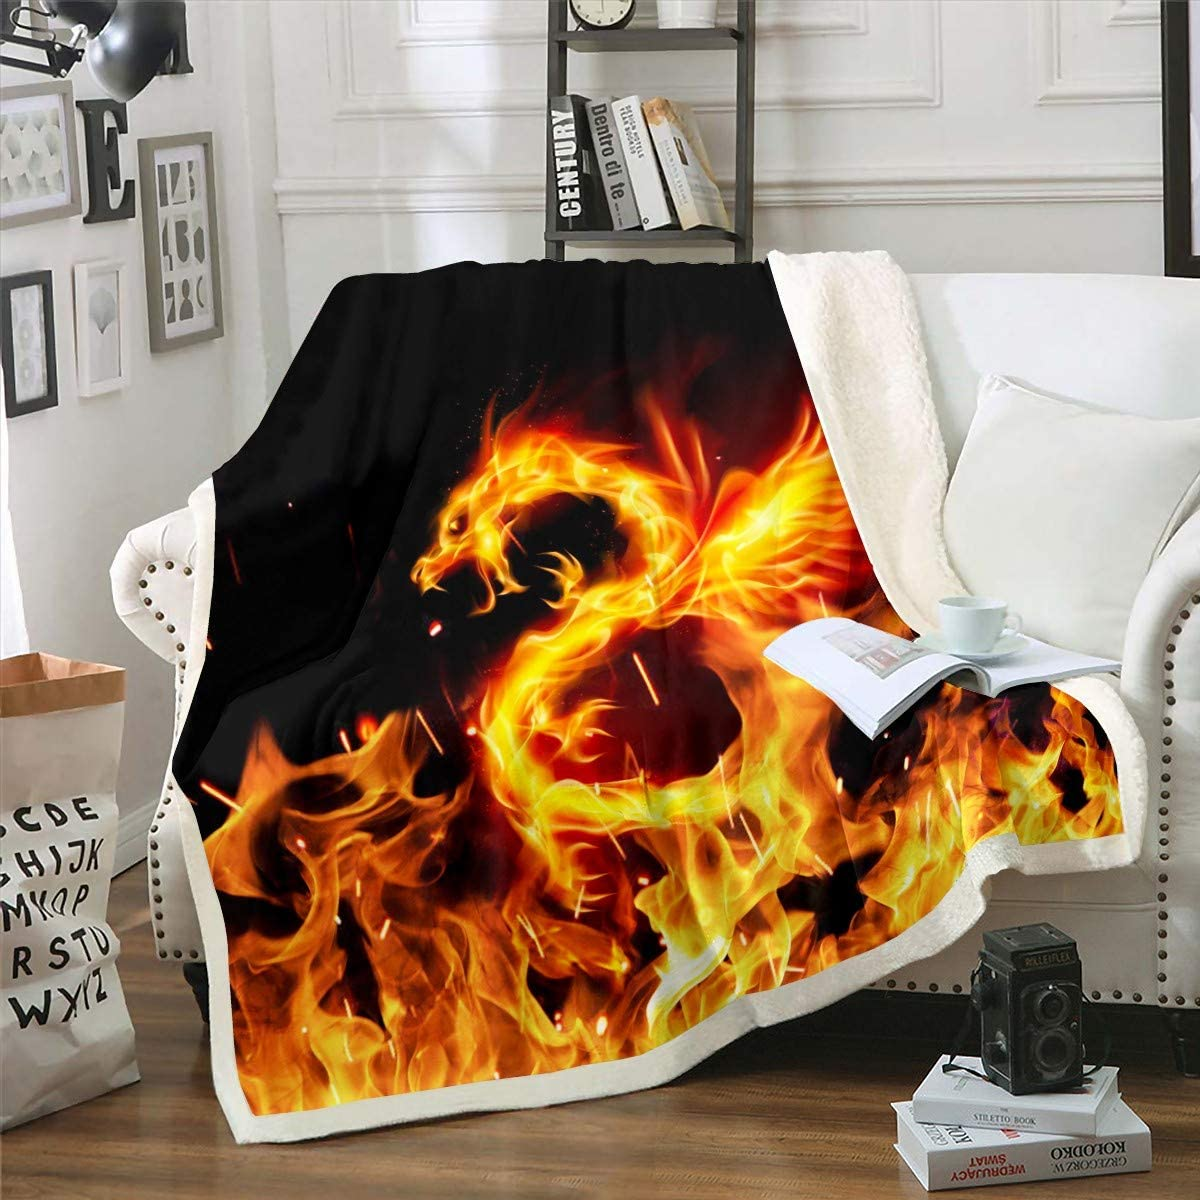 Kids Plush Blanket 新作からSALEアイテム等お得な商品 満載 Fire Dragon Pattern Chic 数量限定アウトレット最安価格 Throw Fleece